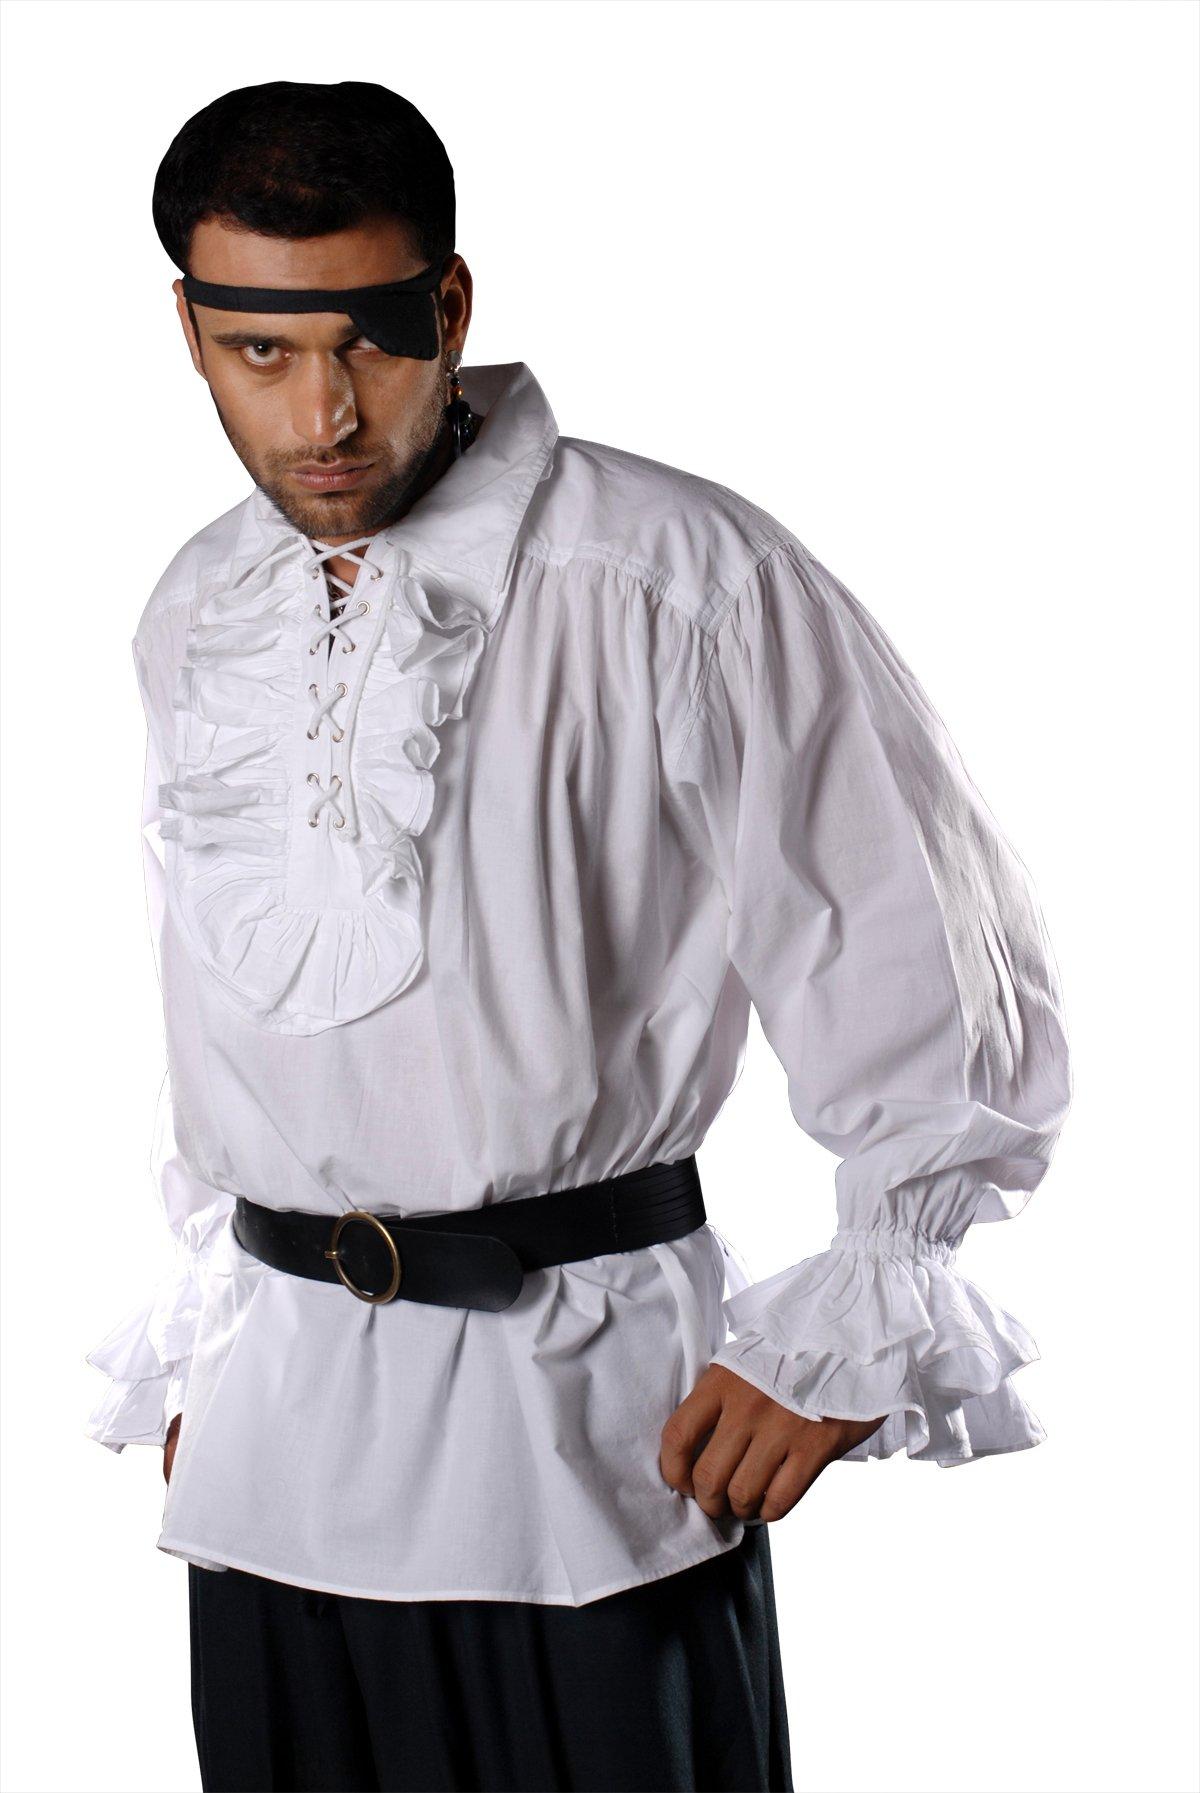 Armor Venue Captain Charles Vane Pirate Shirt (in cotton) - Pirate Costume - White S/M